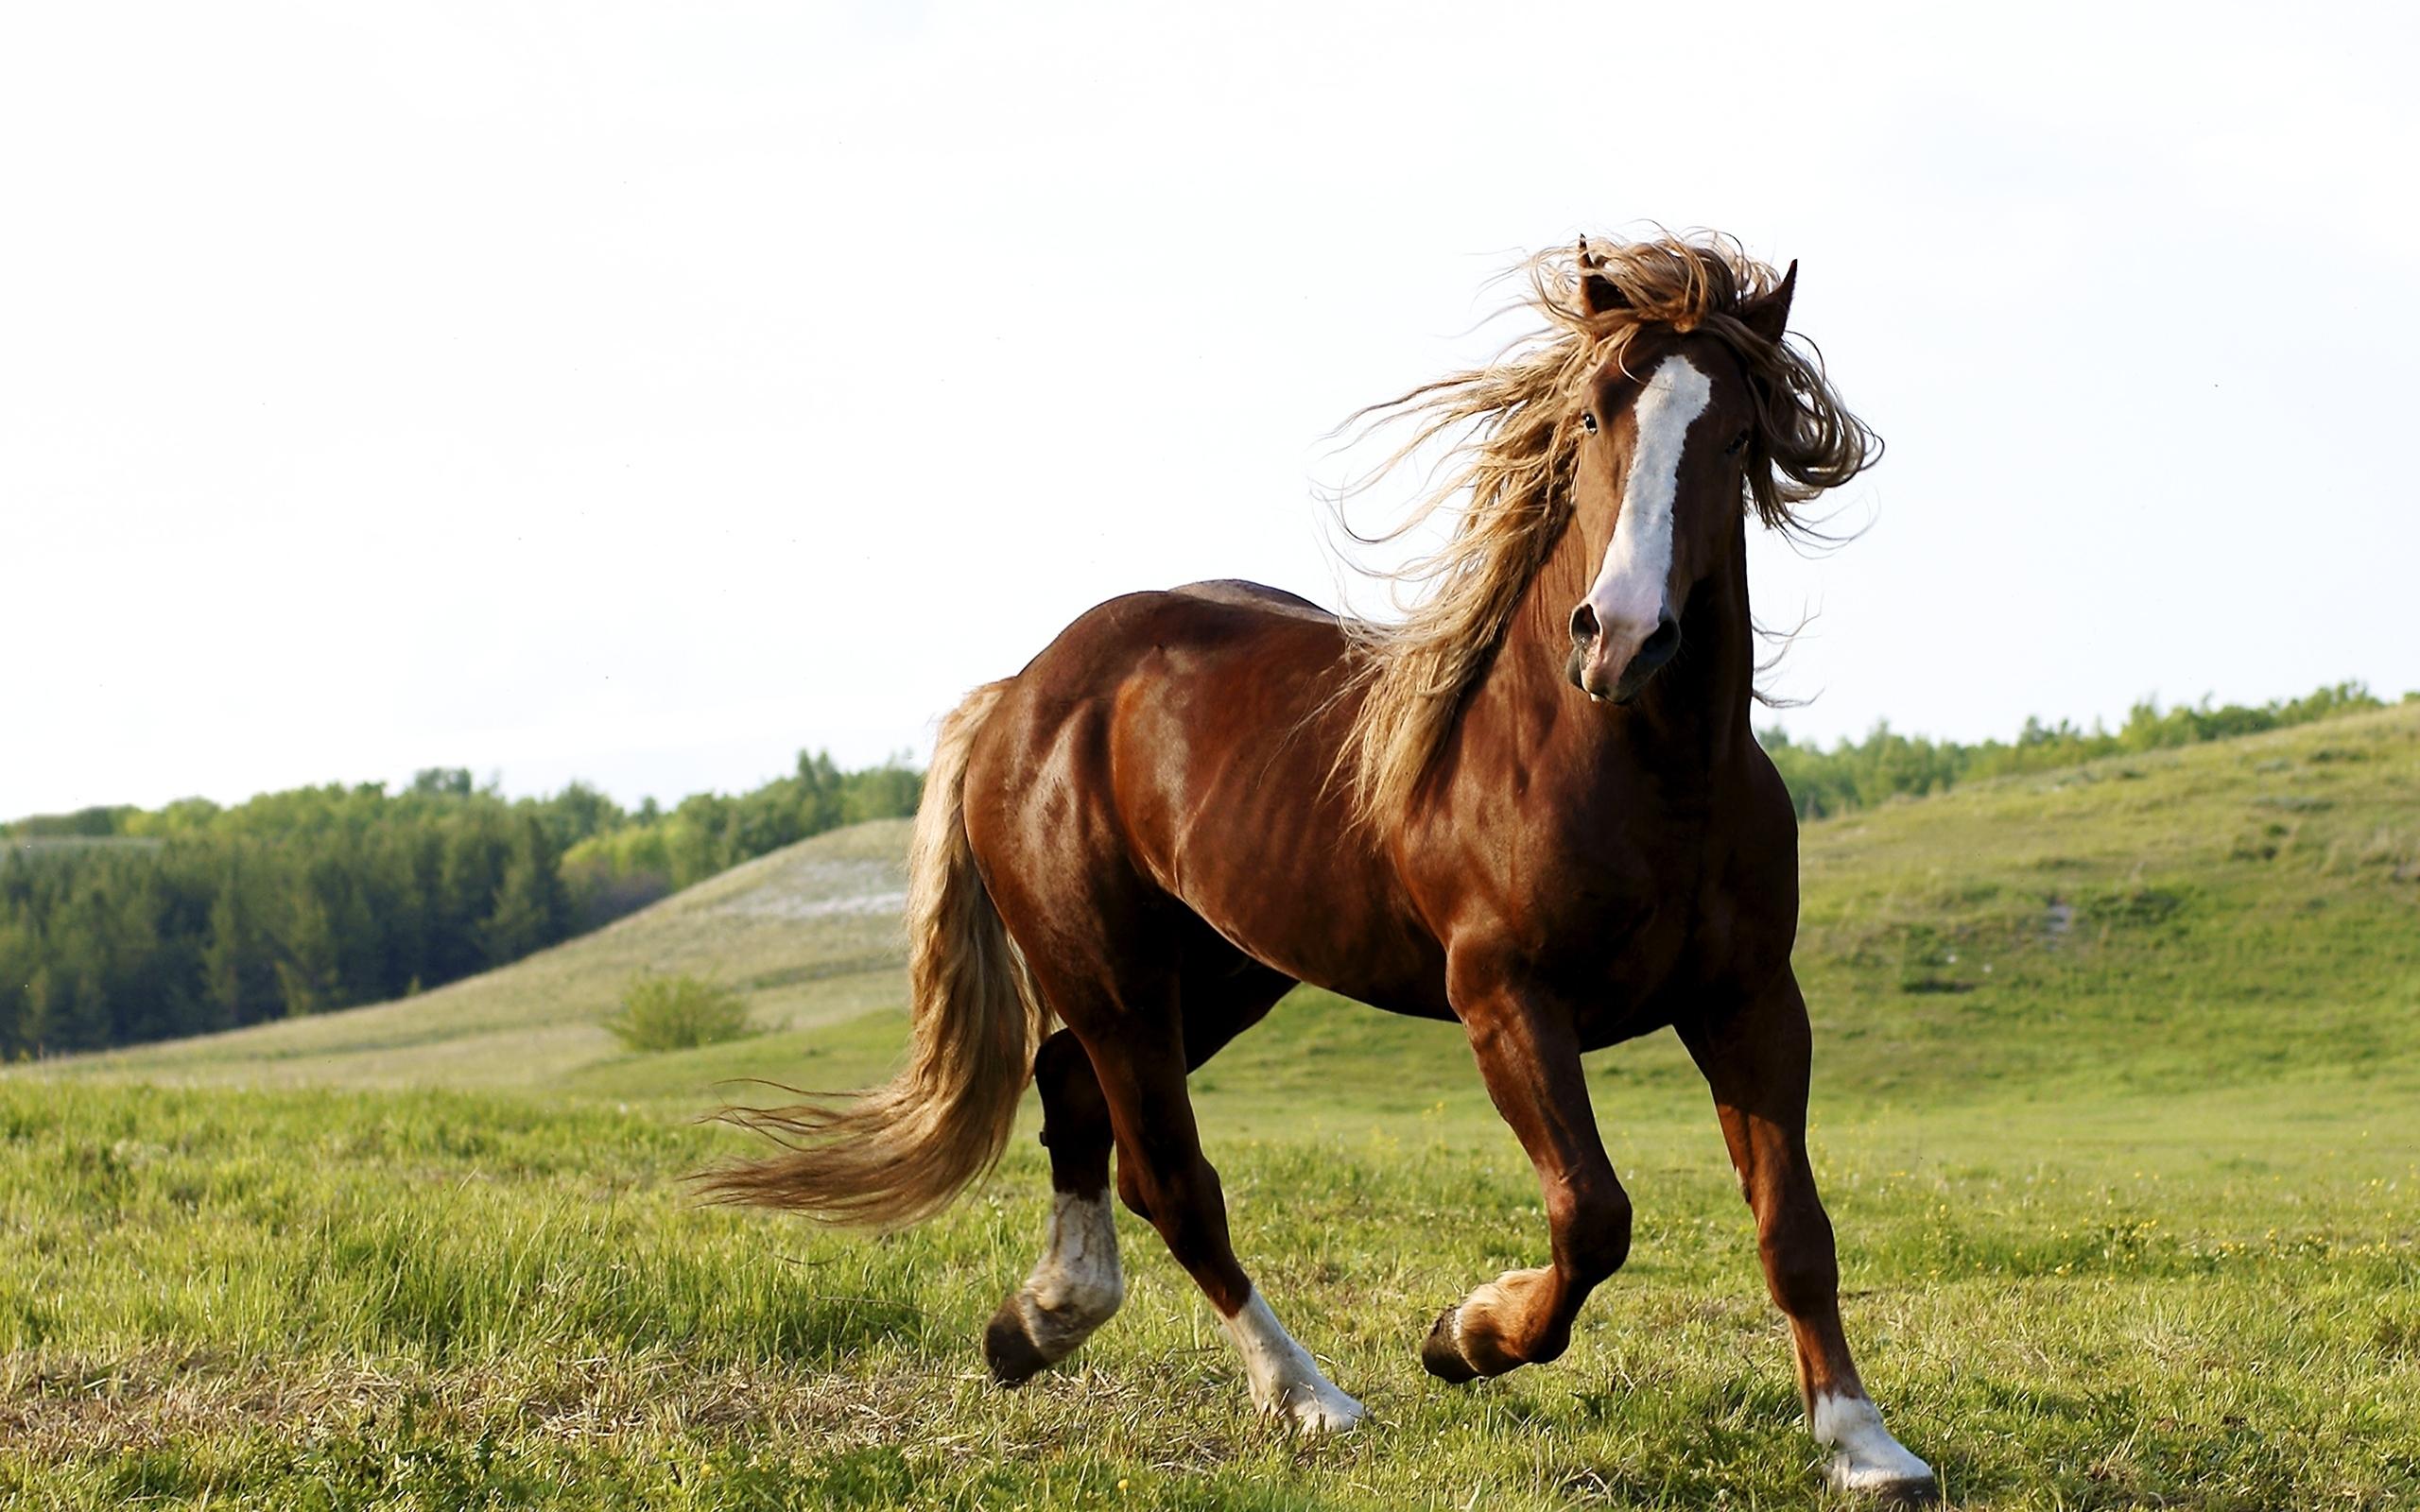 Animals Horses Riding a horse 033632 jpg 2560x1600